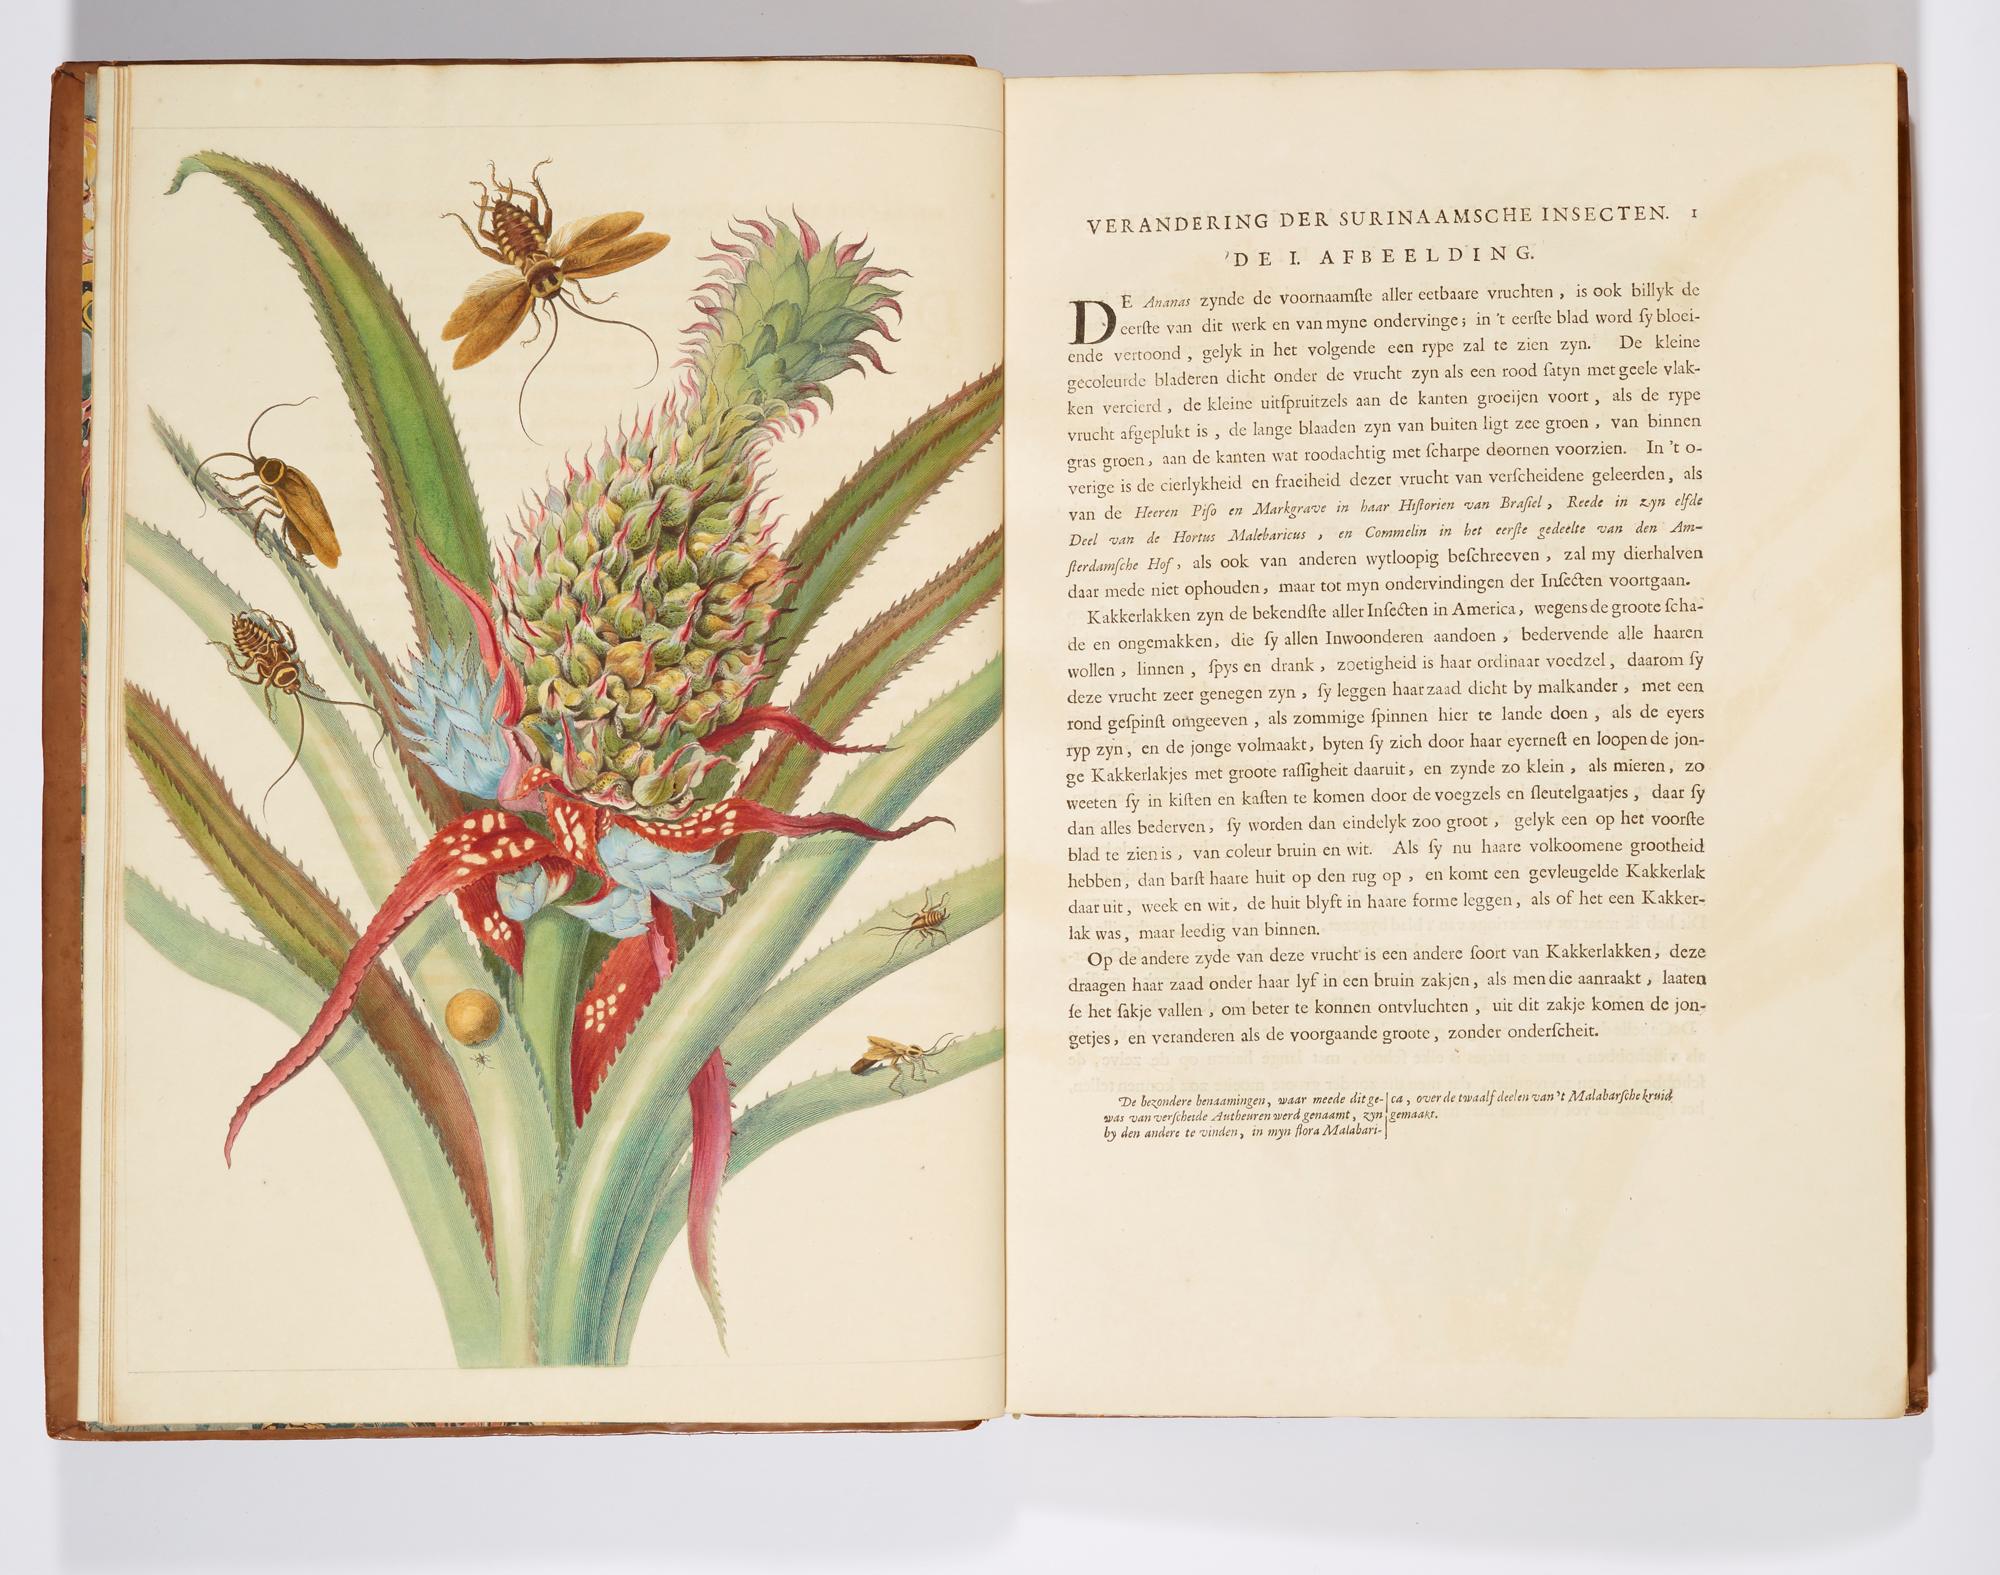 Maria Sybilla Merian's Insects of Suriname